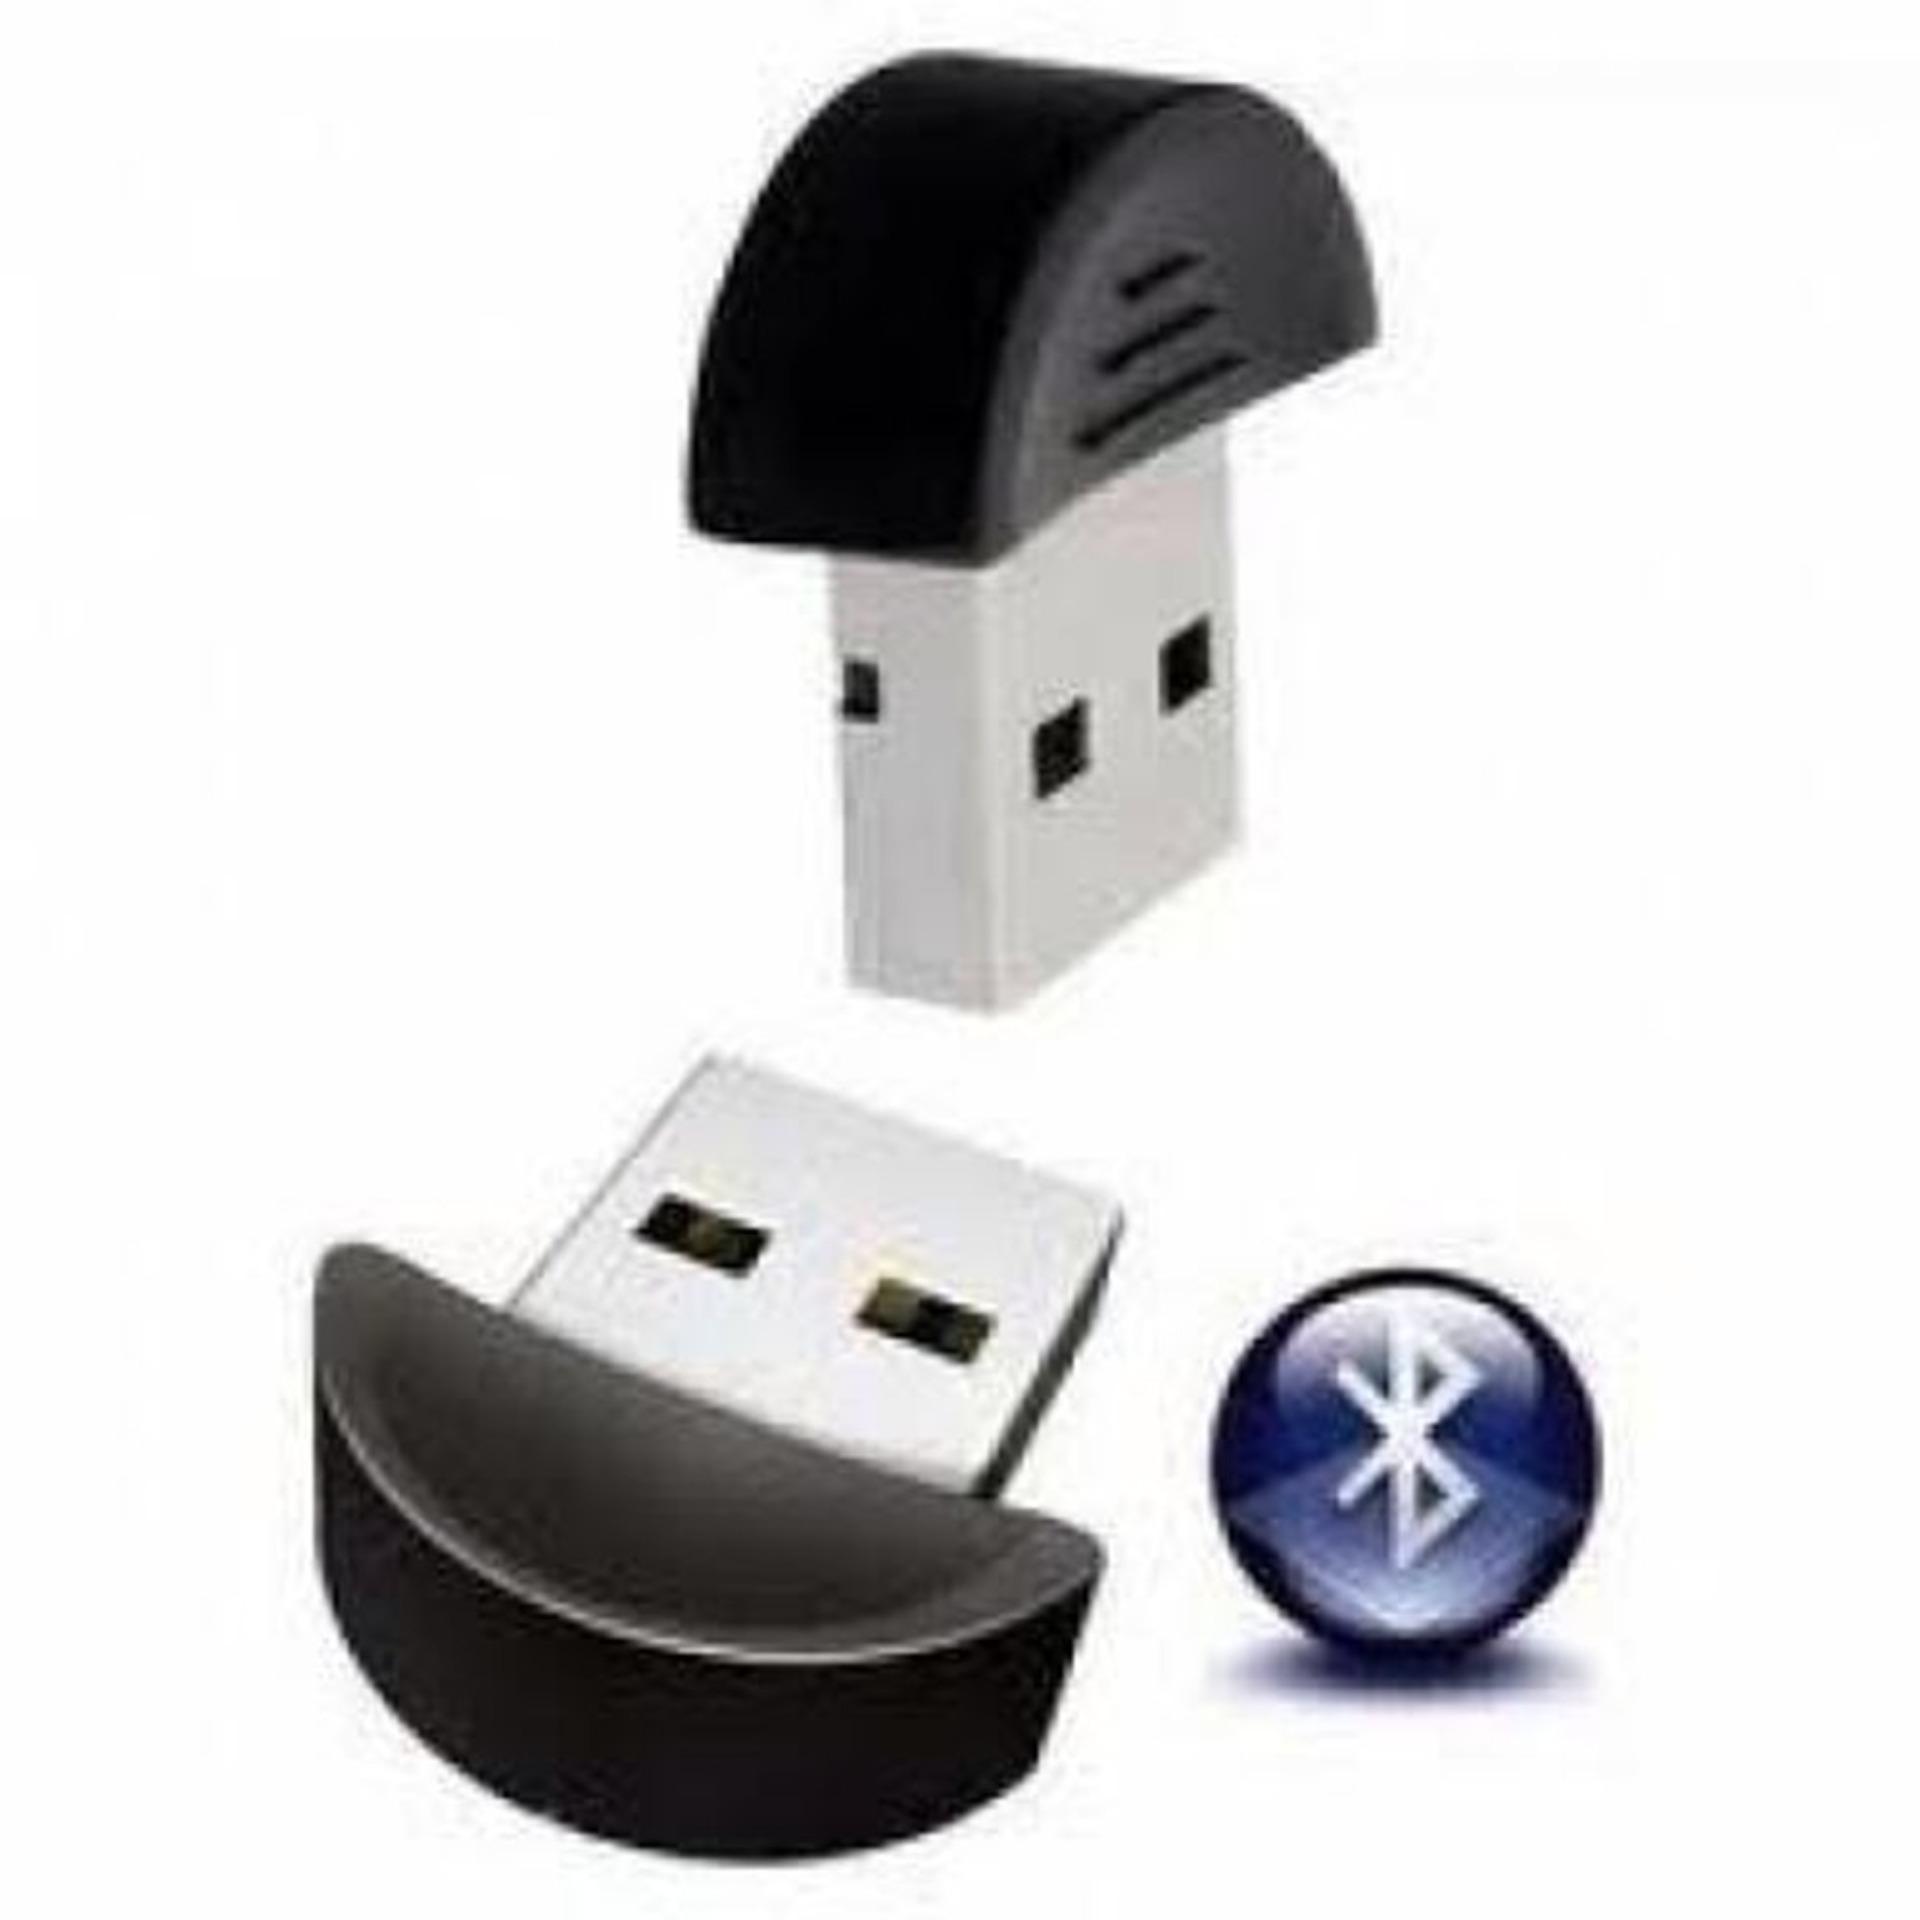 Bloetooth USB 2.0 Komputer Blutut USB Dongle Adaptor Converter Range Jarak 0-100 m